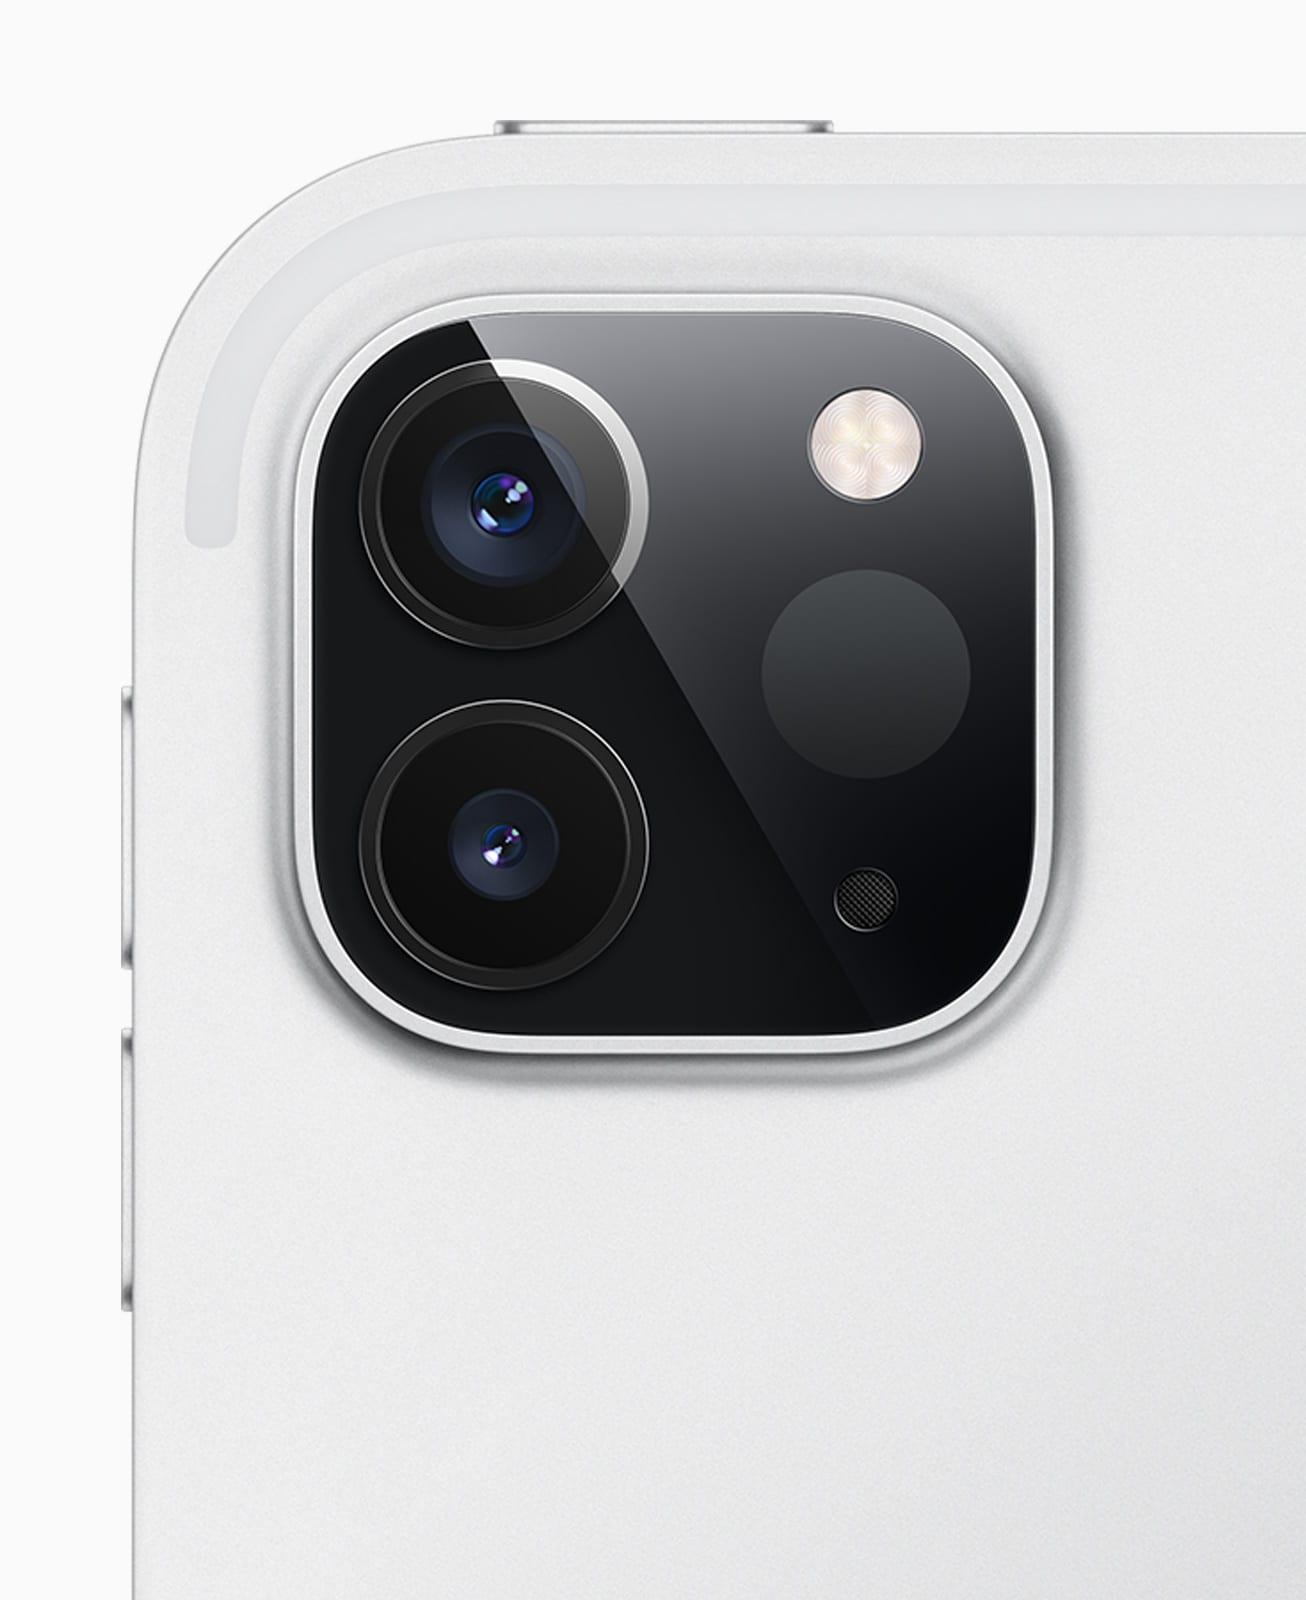 iPad Pro 3rd generation Pro Camera